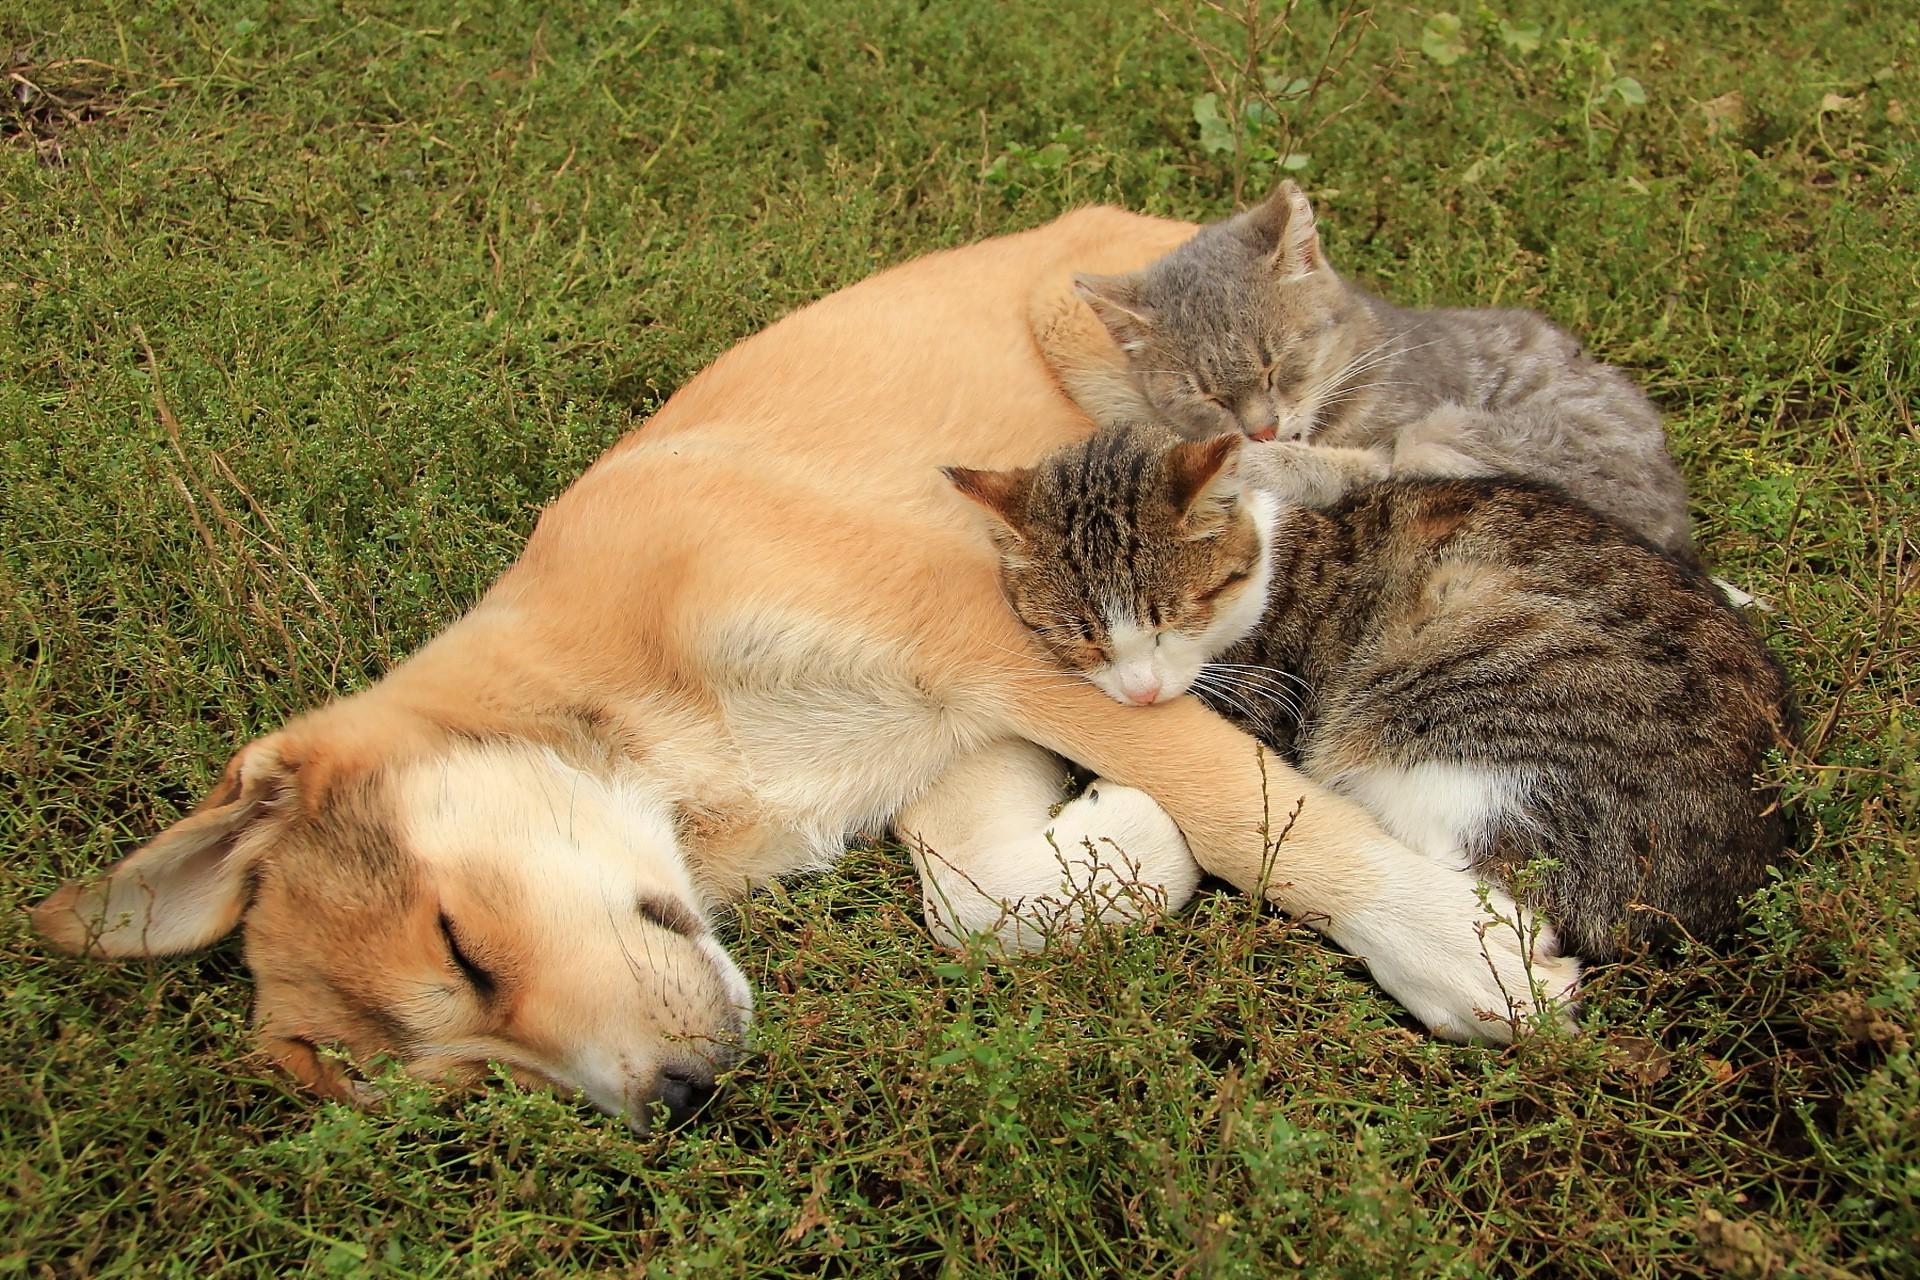 Cat Animals Grass Dog Cats Mammal 1920x1280 Px Vertebrate Like